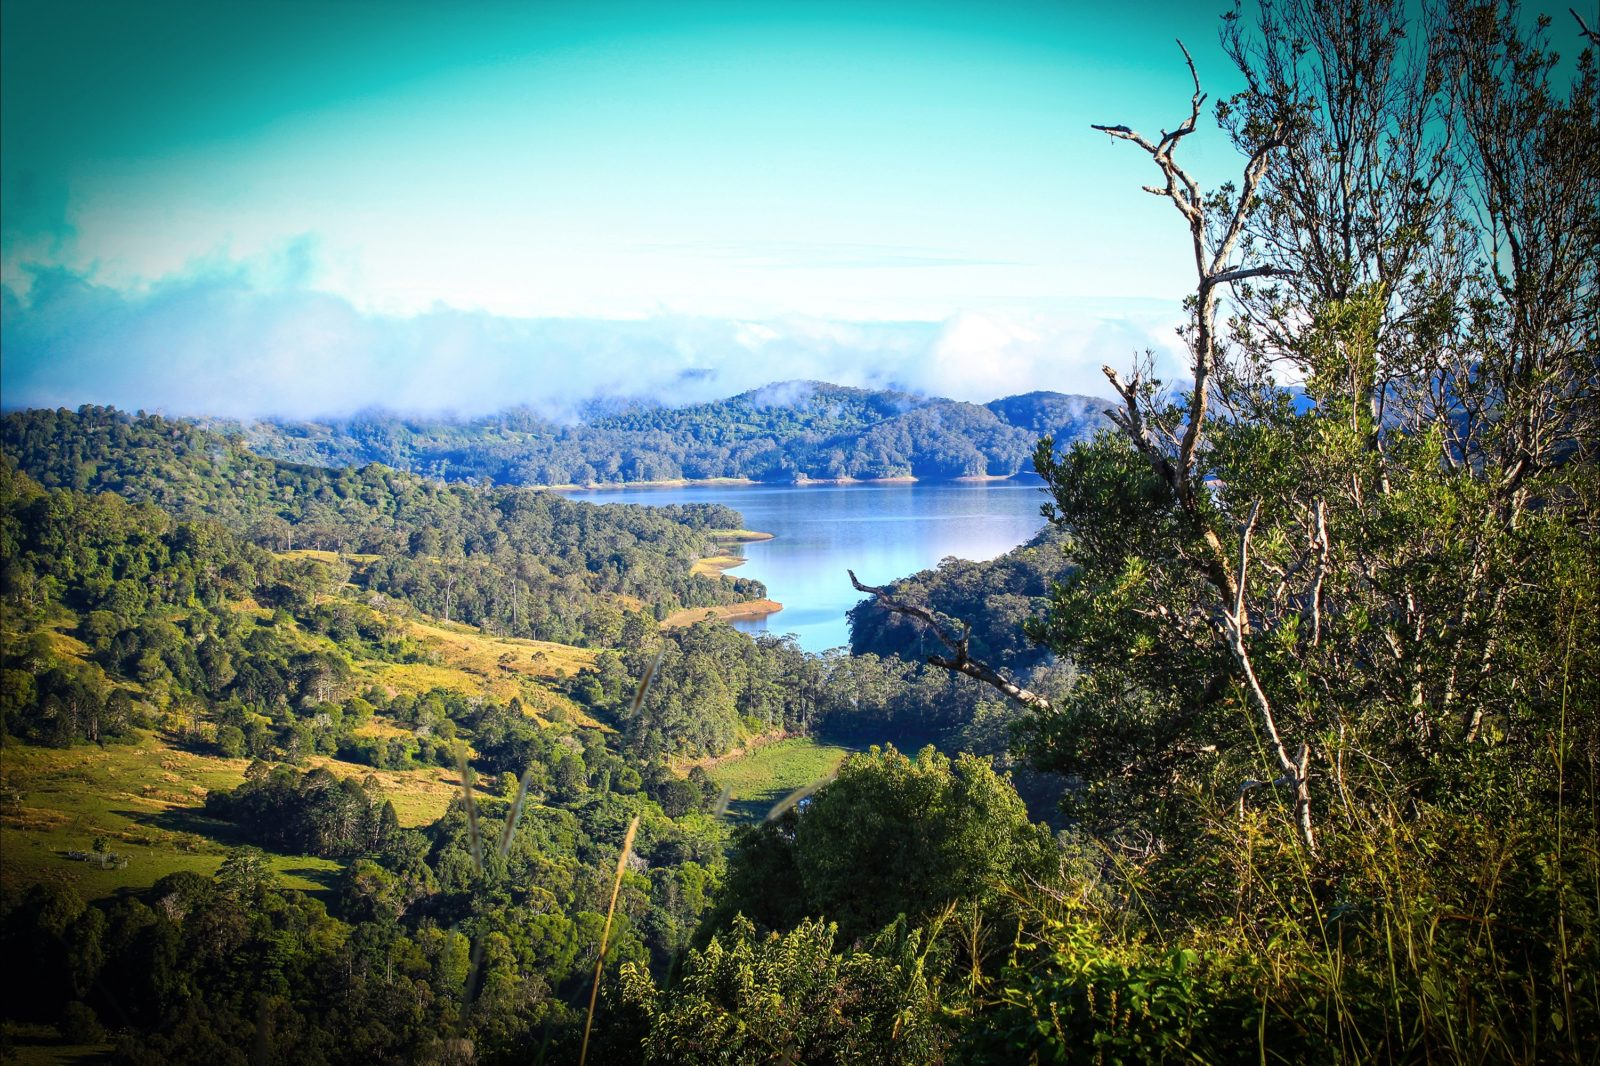 Baroon Pocket Dam, Sunshine Coast